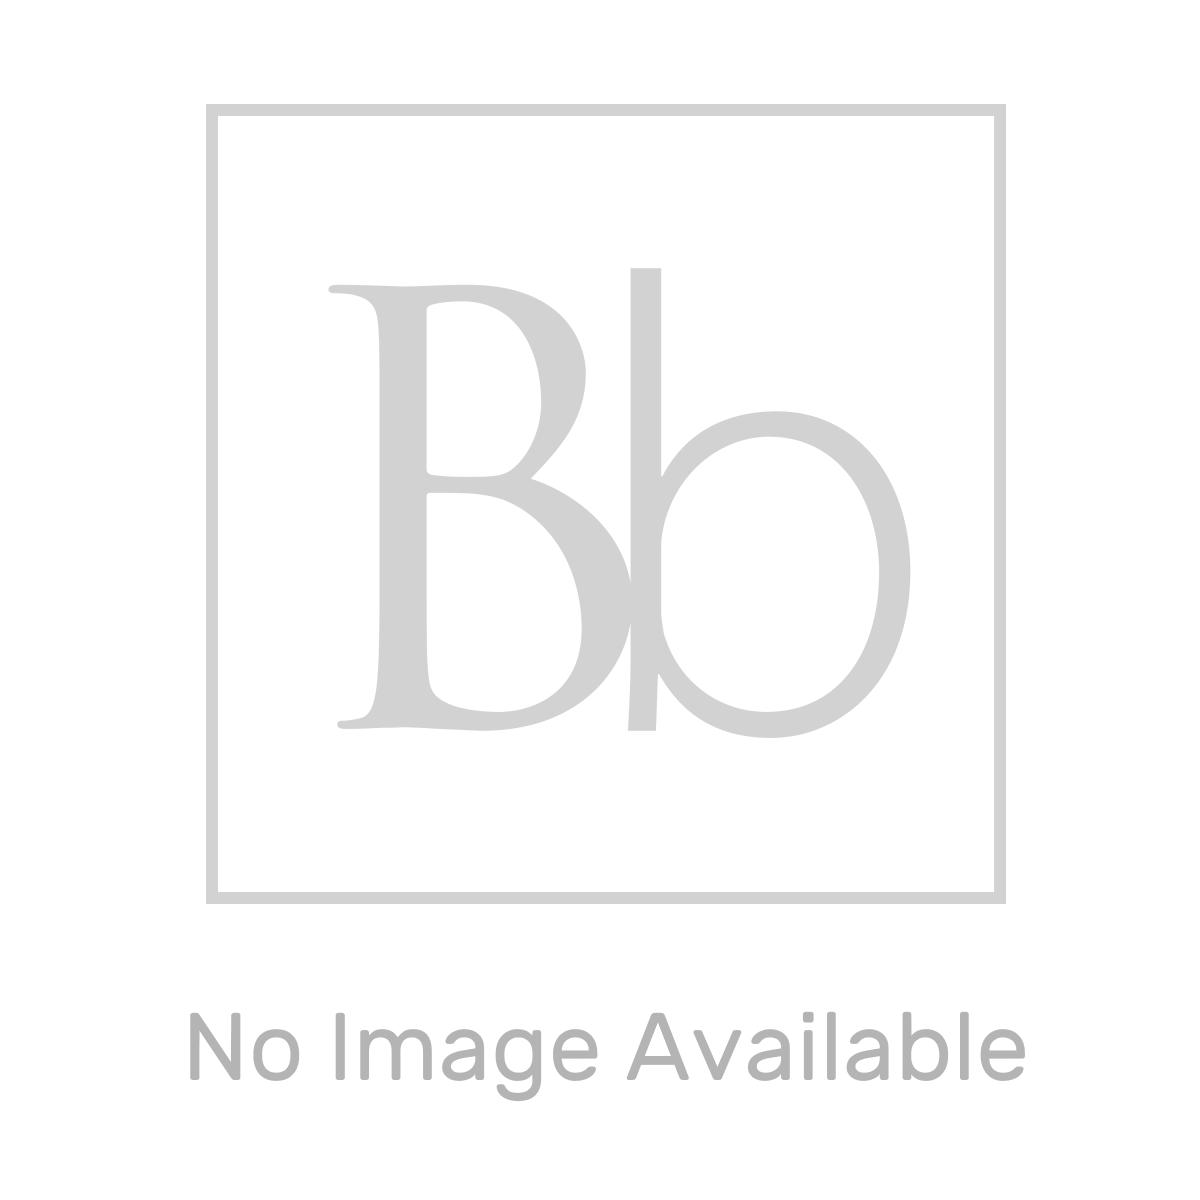 Aquadart White Slate Shower Tray 1200 x 760 Overhead